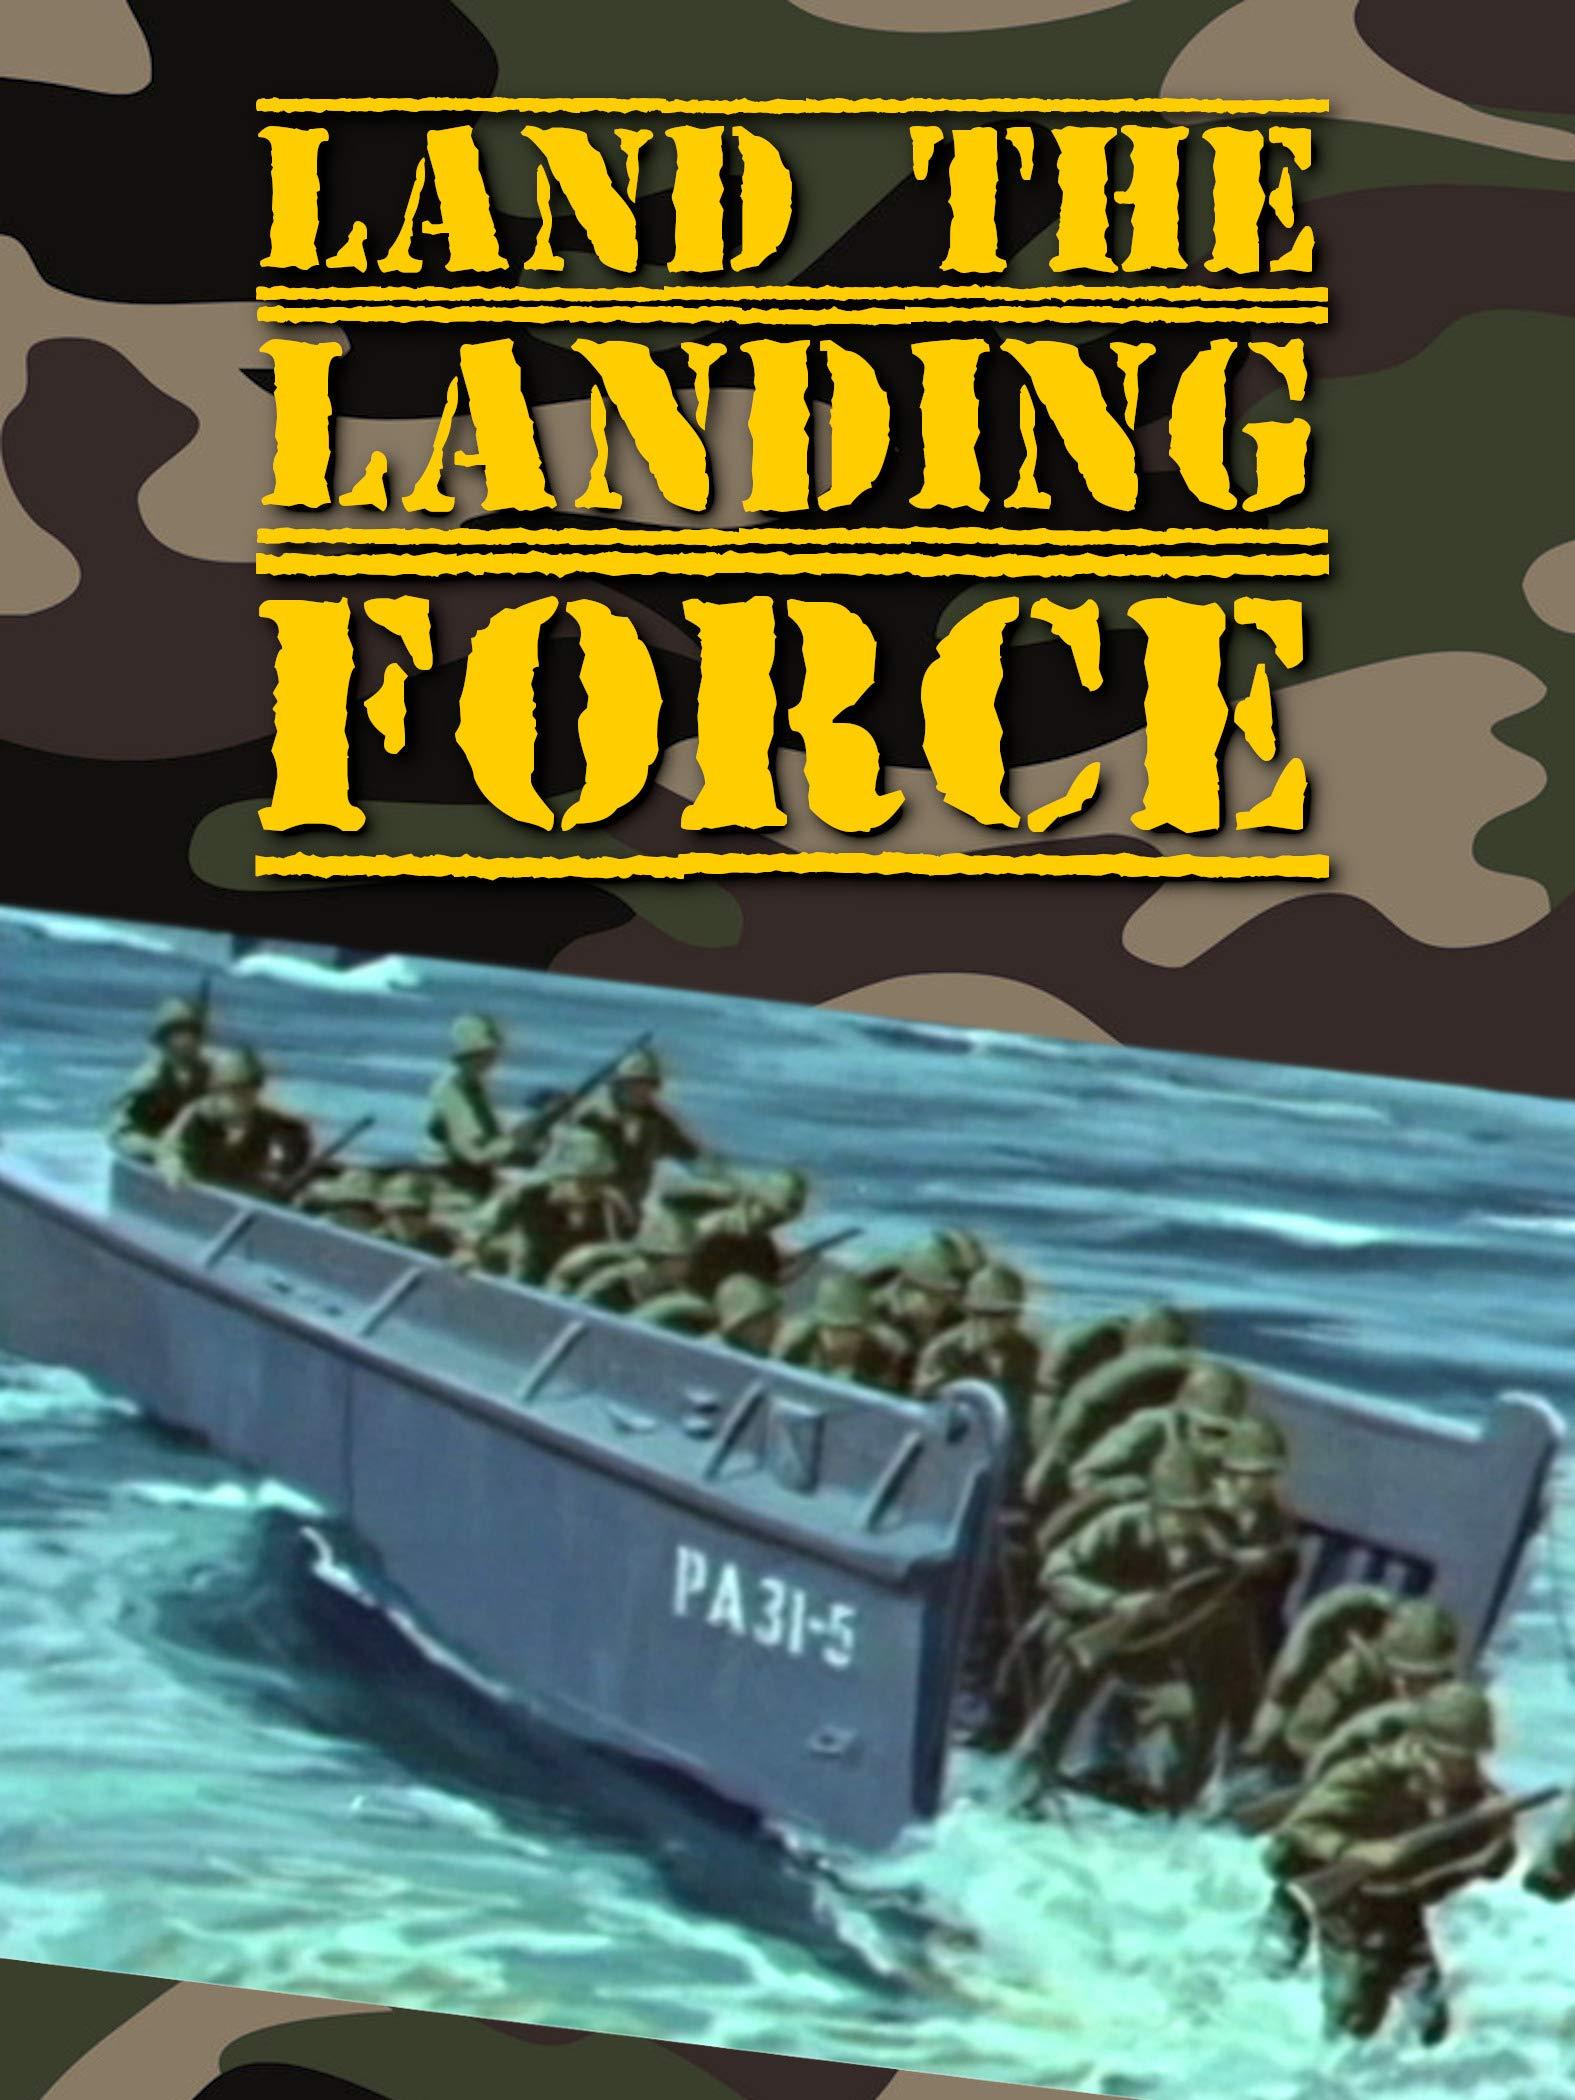 Land the Landing Force on Amazon Prime Video UK